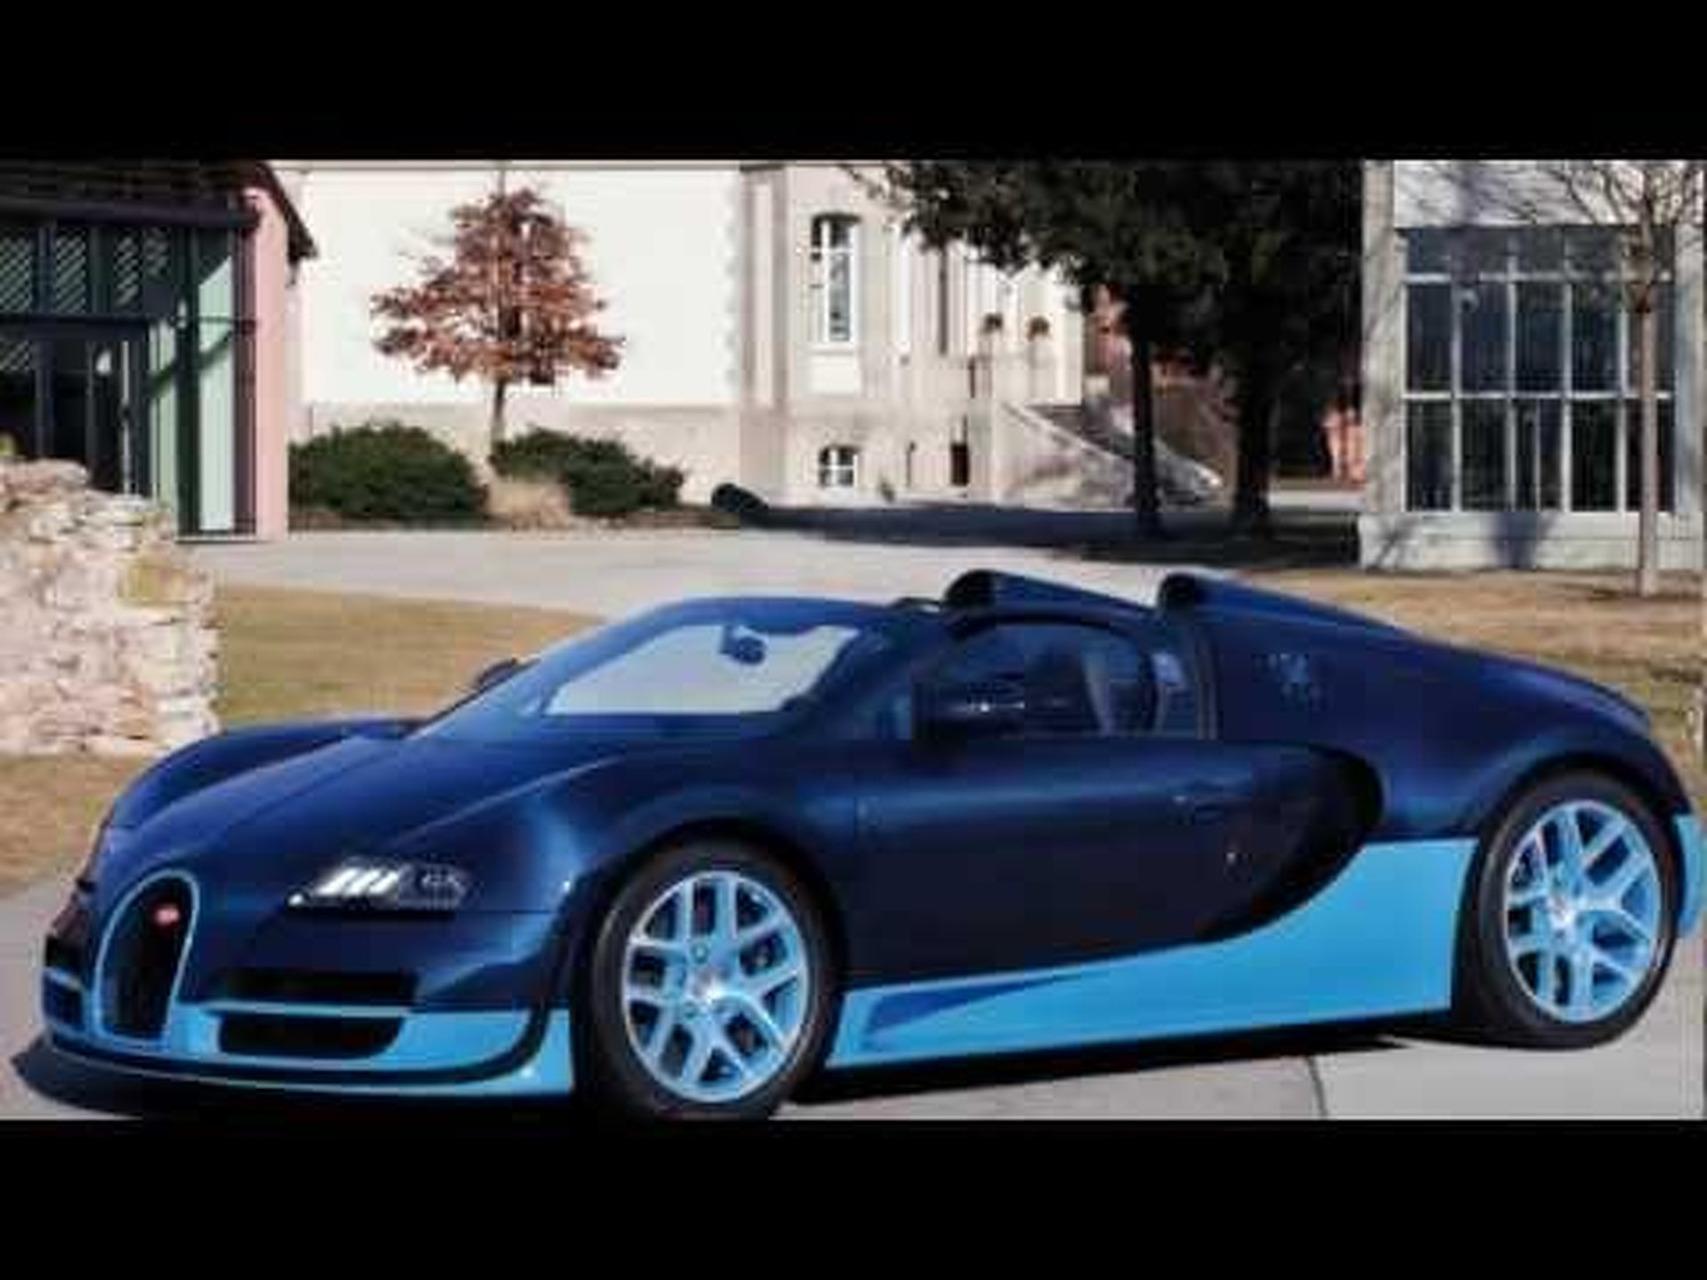 Bugatti Veyron Grand Sport Vitesse - 2012 HD